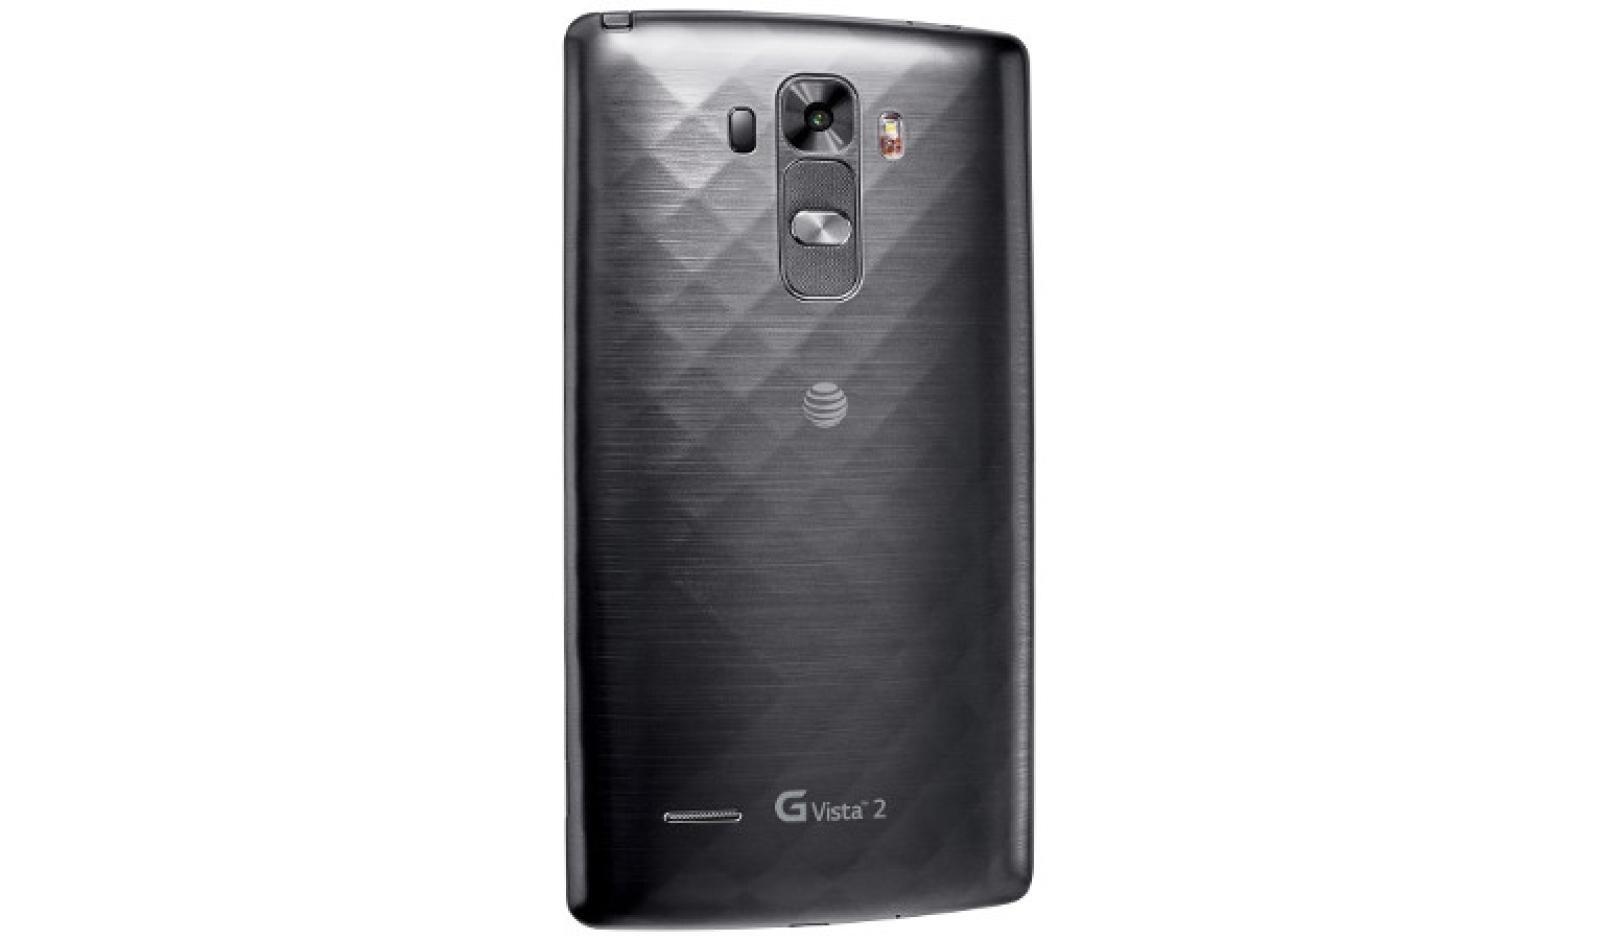 d0a645ce2 LG G Vista 2 (H740) Mobile Cell Phone for AT T